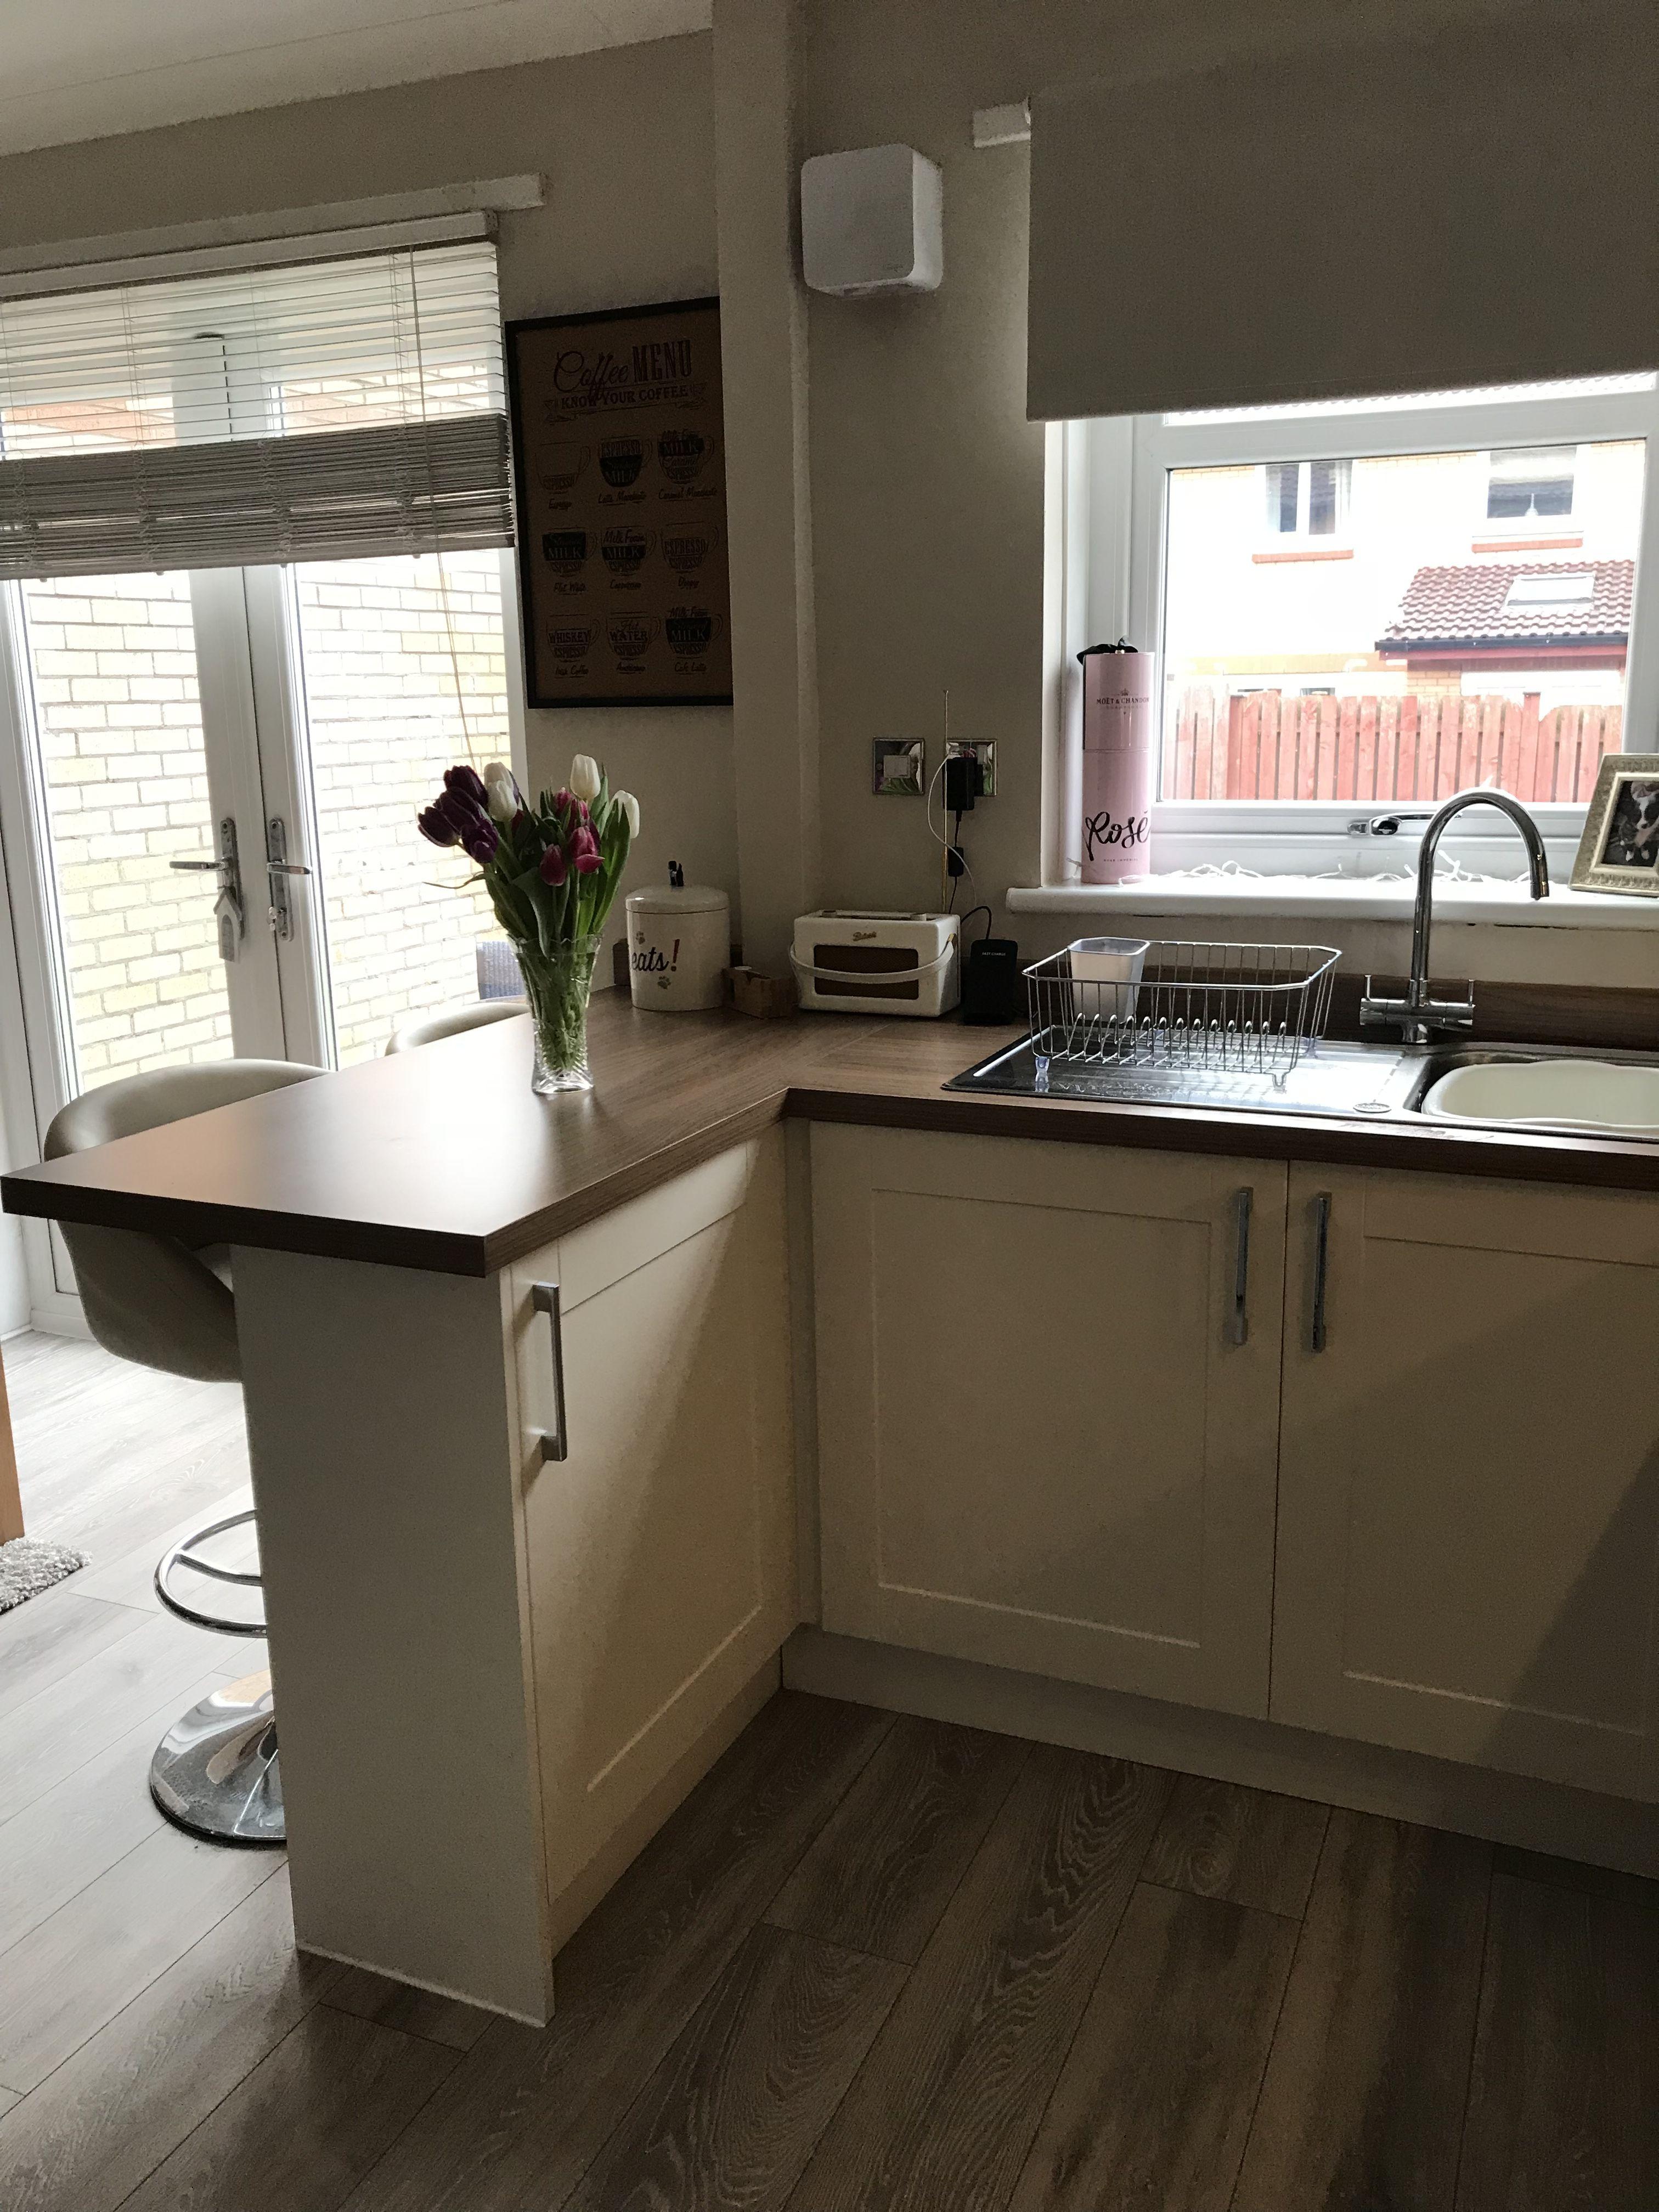 Breakfast bar in my new kitchen Kitchen remodel small